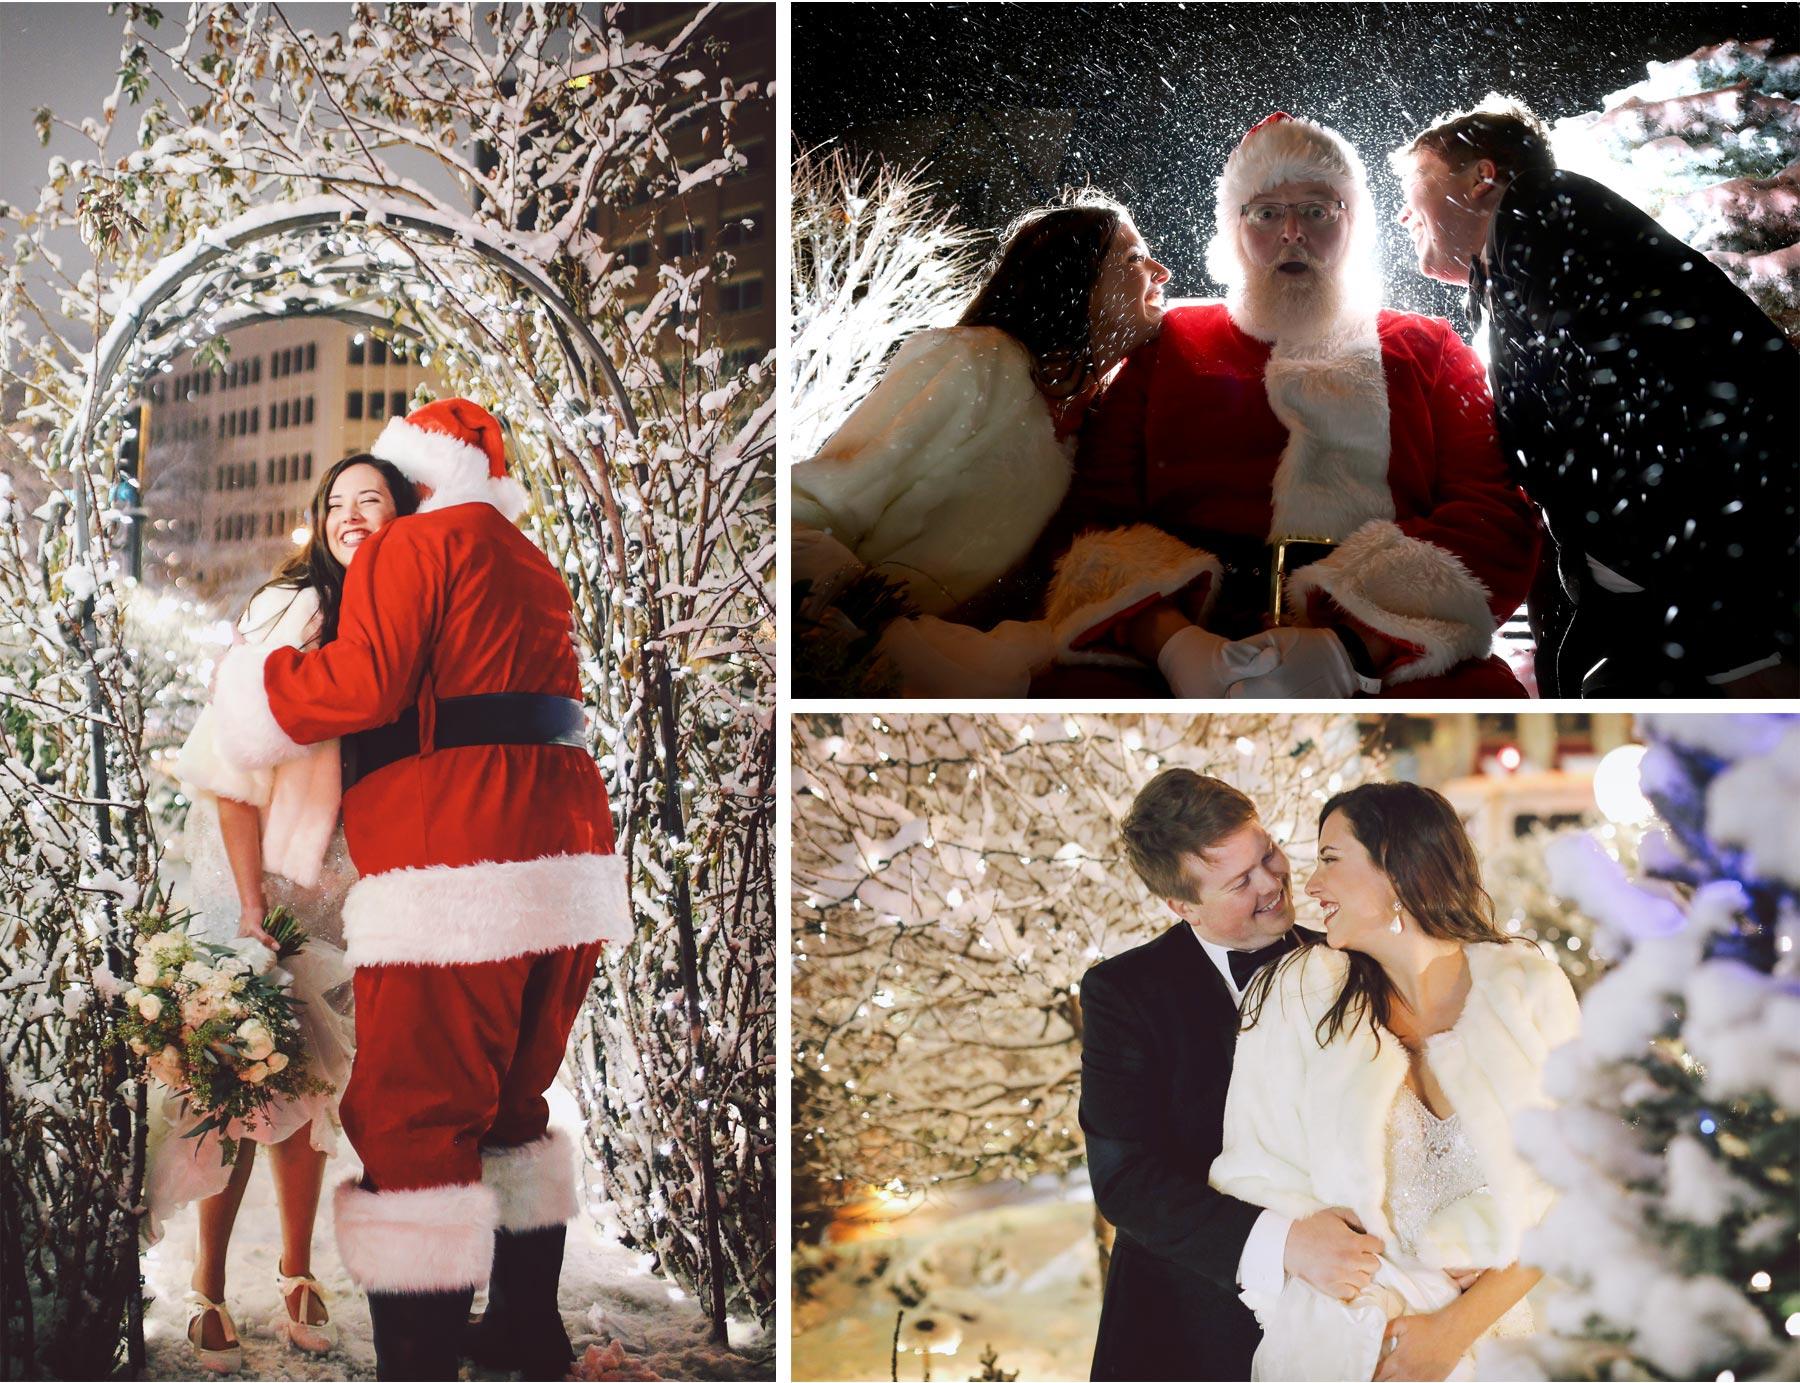 21-Saint-Paul-Minnesota-Wedding-Photography-by-Vick-Photography--Couple-Snow-Storm-Santa-Winter-Wedding-Sami-and-Nick.jpg